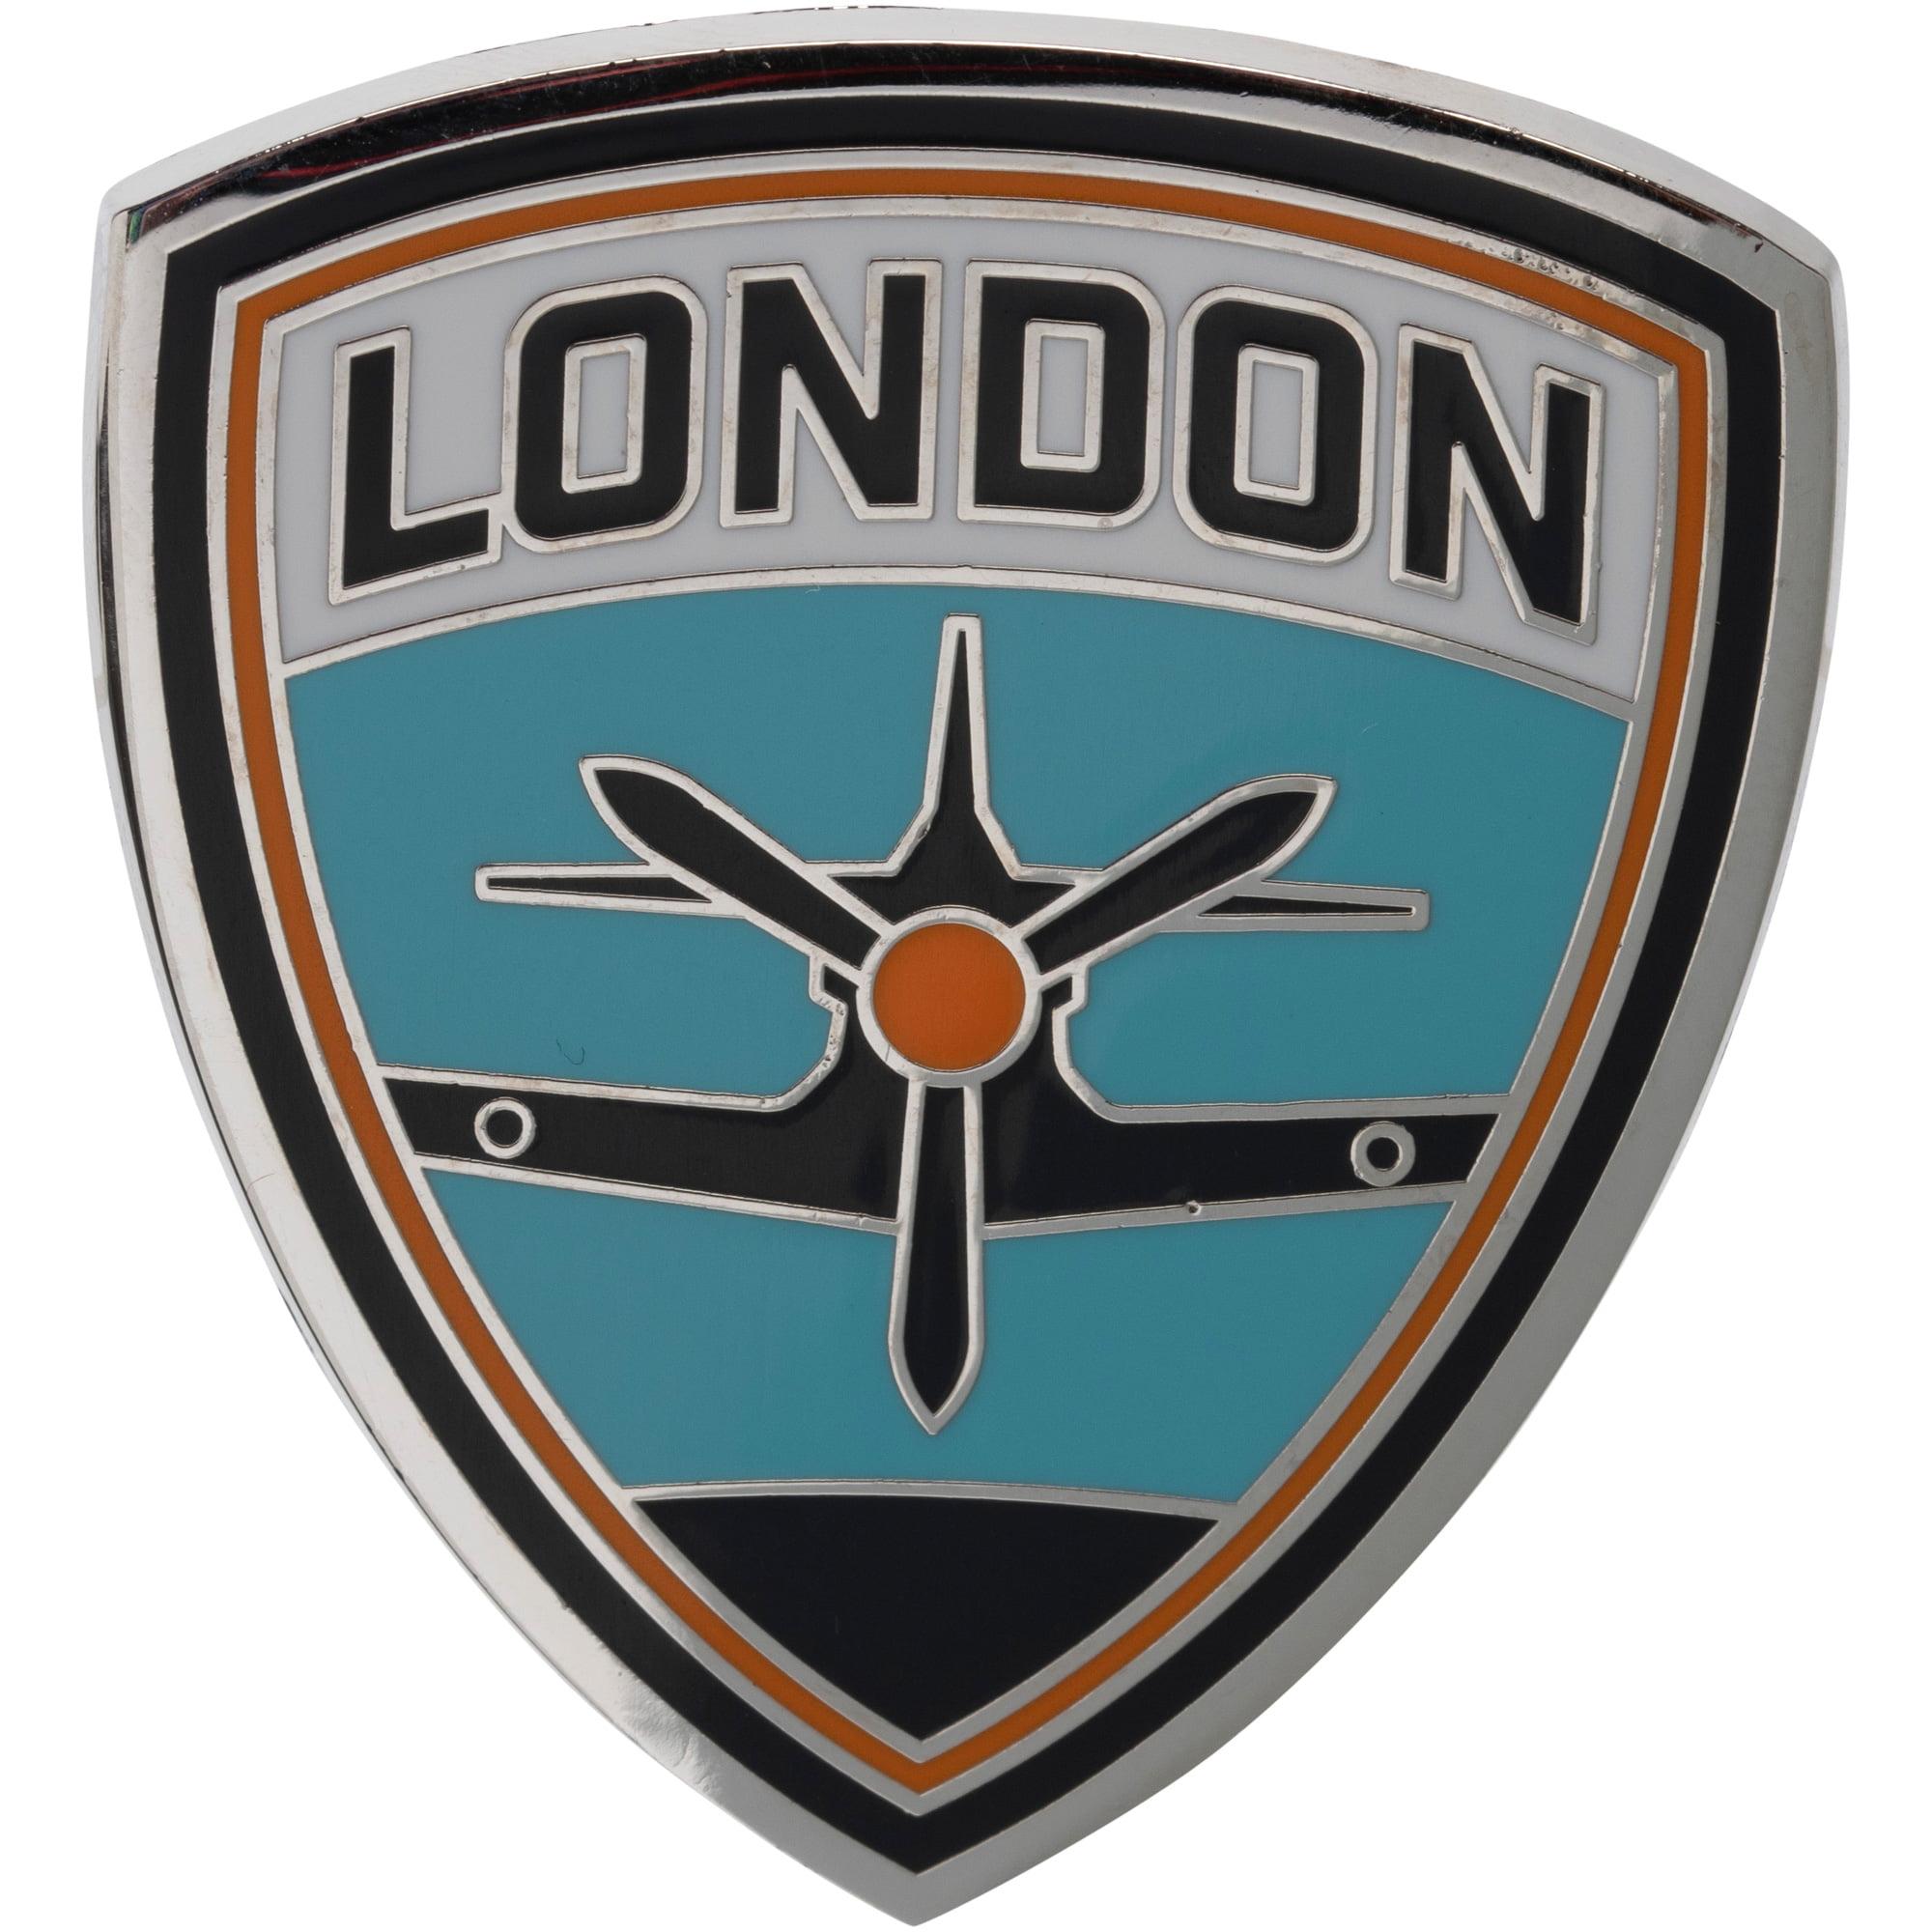 London Spitfire Overwatch League Team Logo Pin - No Size